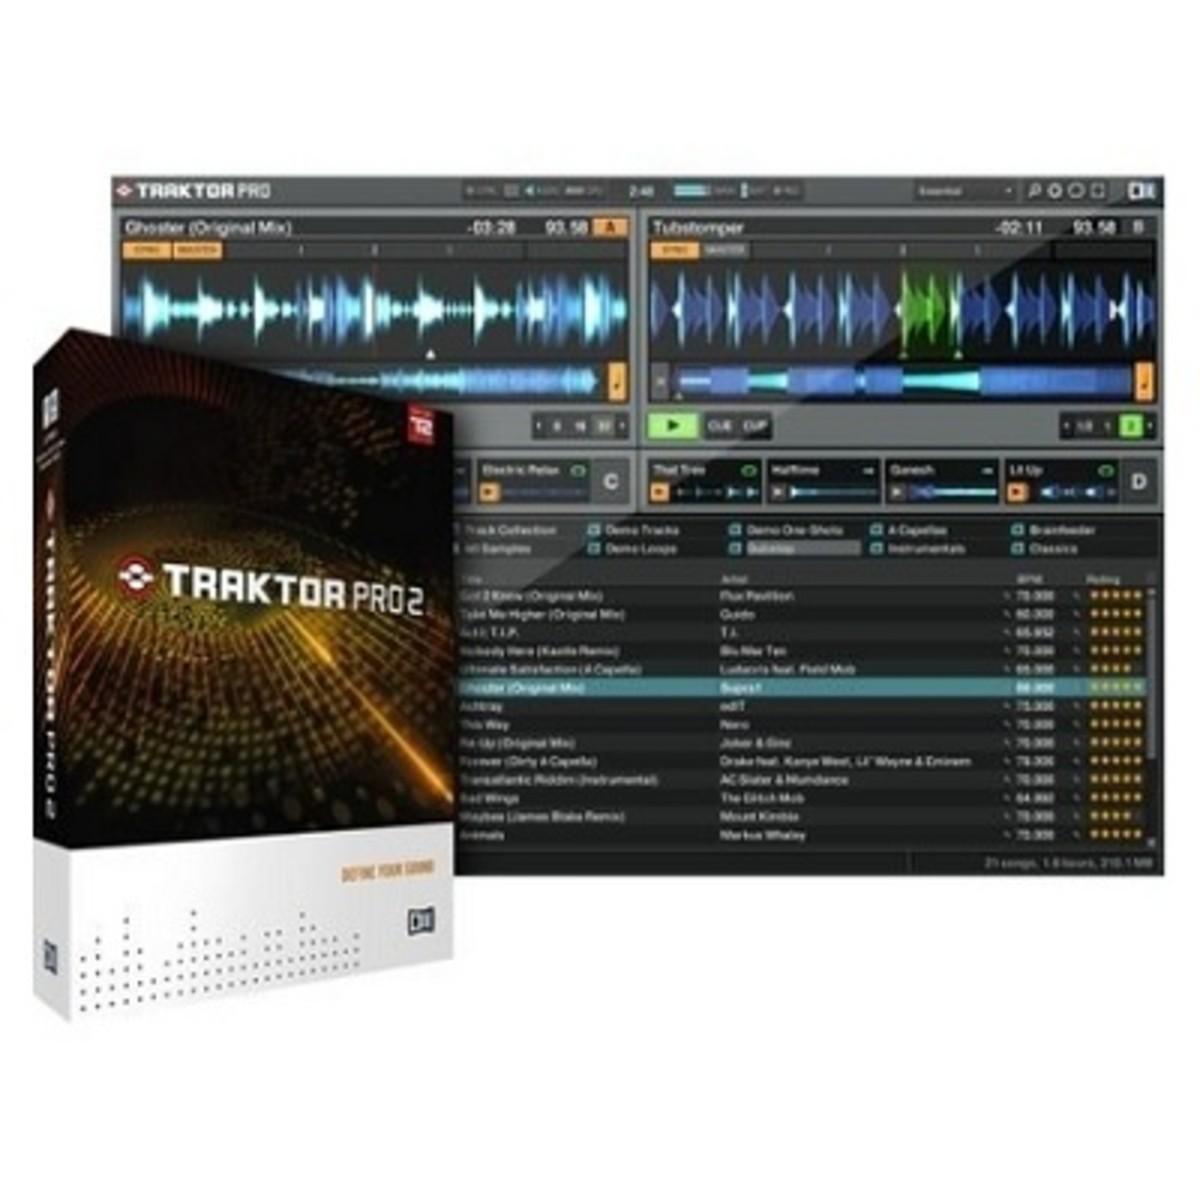 Native Instruments Traktor Pro 2 DJ Software Review - DJBooth